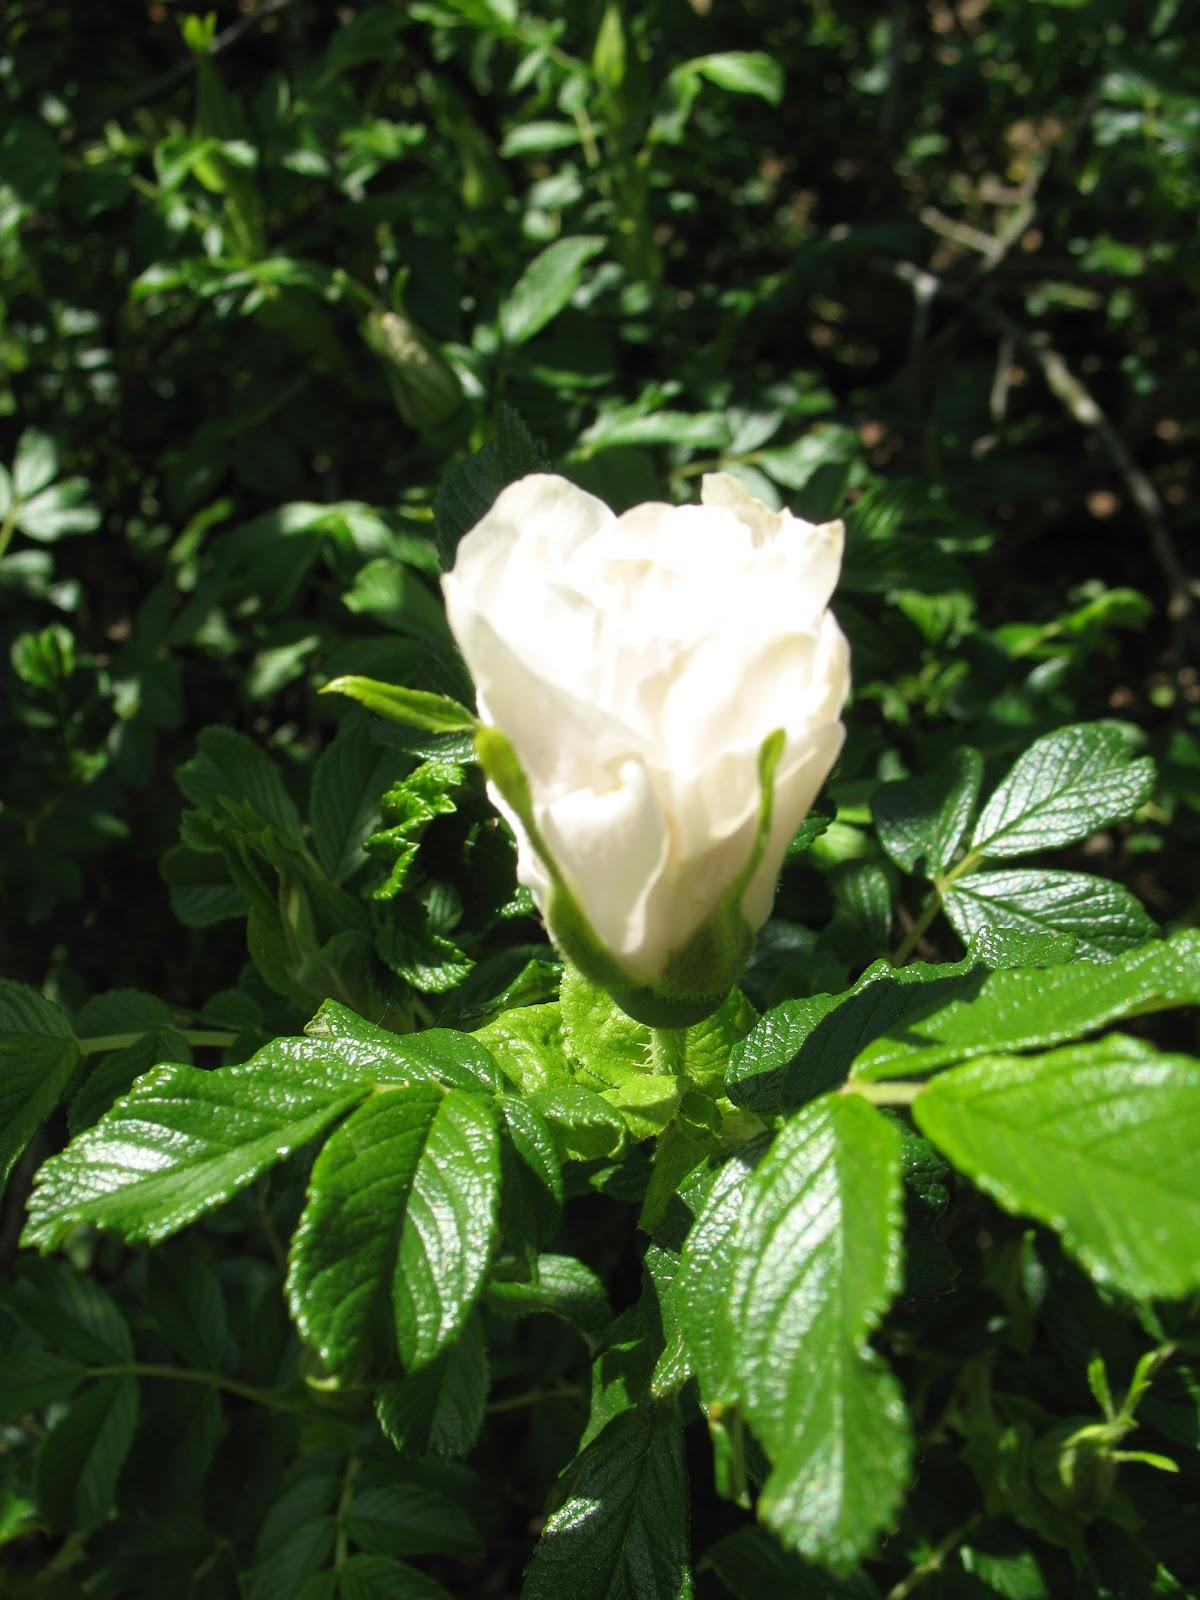 roses du jardin ch neland rosier blanc double de coubert. Black Bedroom Furniture Sets. Home Design Ideas